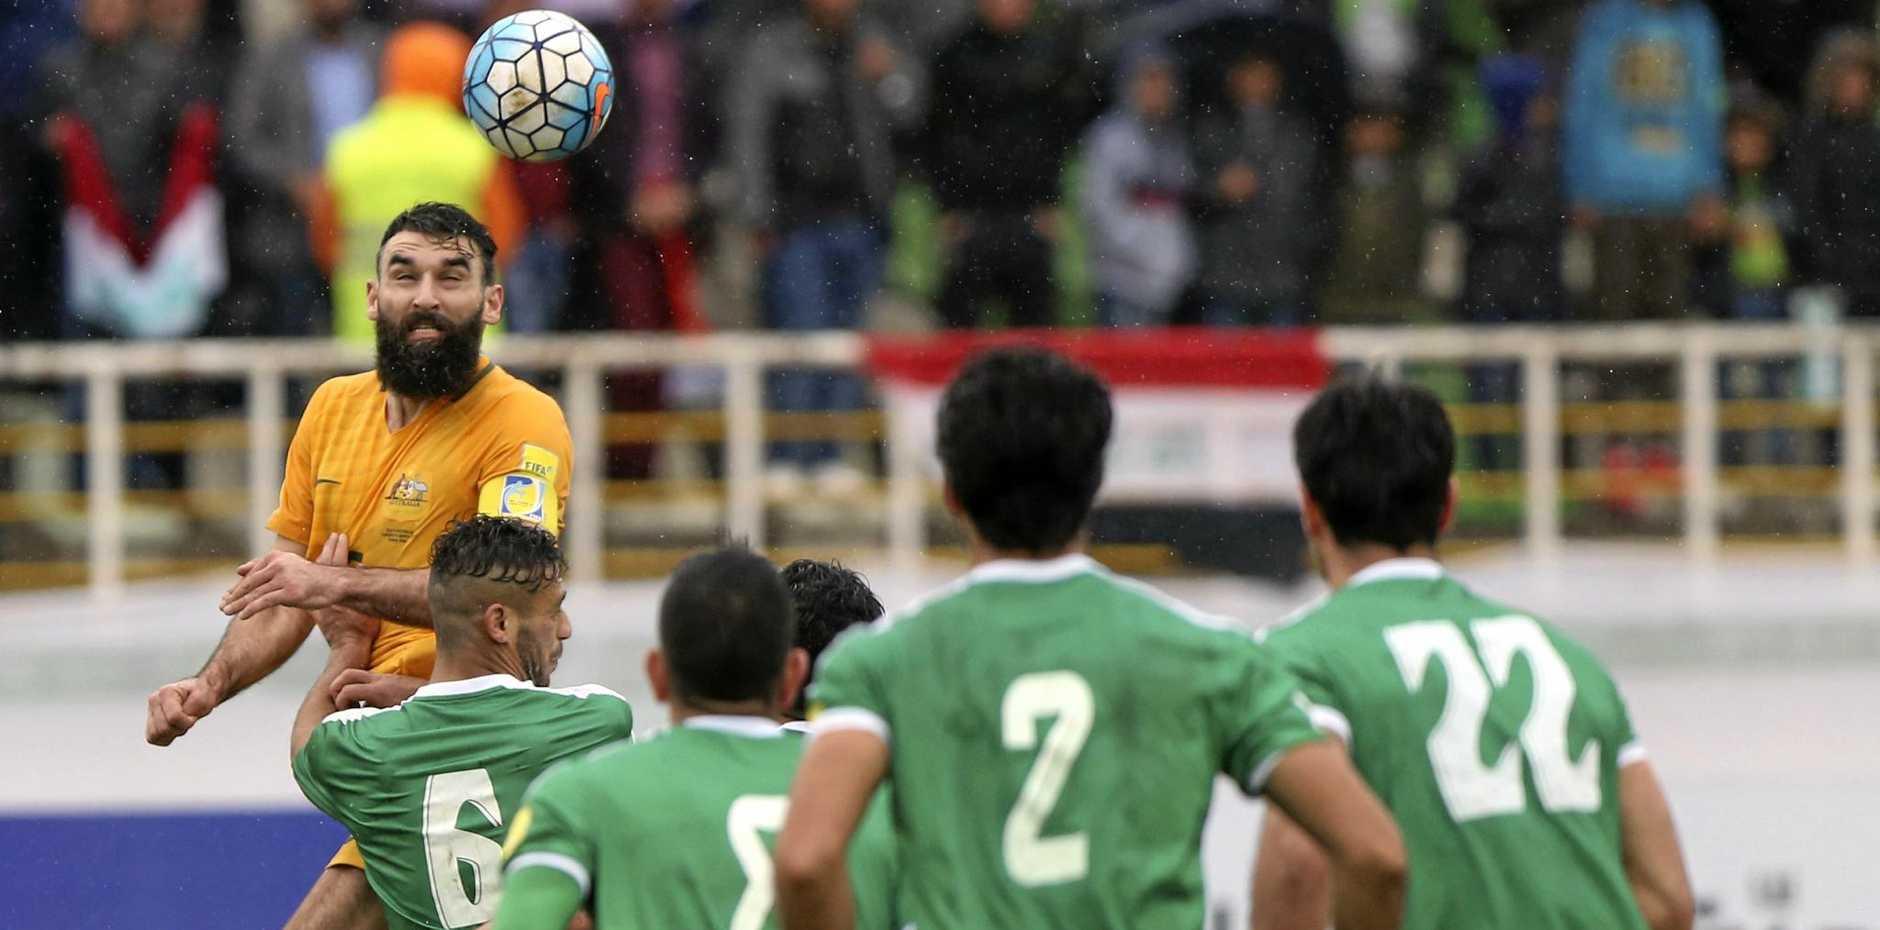 Australia's Mile Jedinak heads the ball against Iraq during their World Cup qualifier in Tehran.